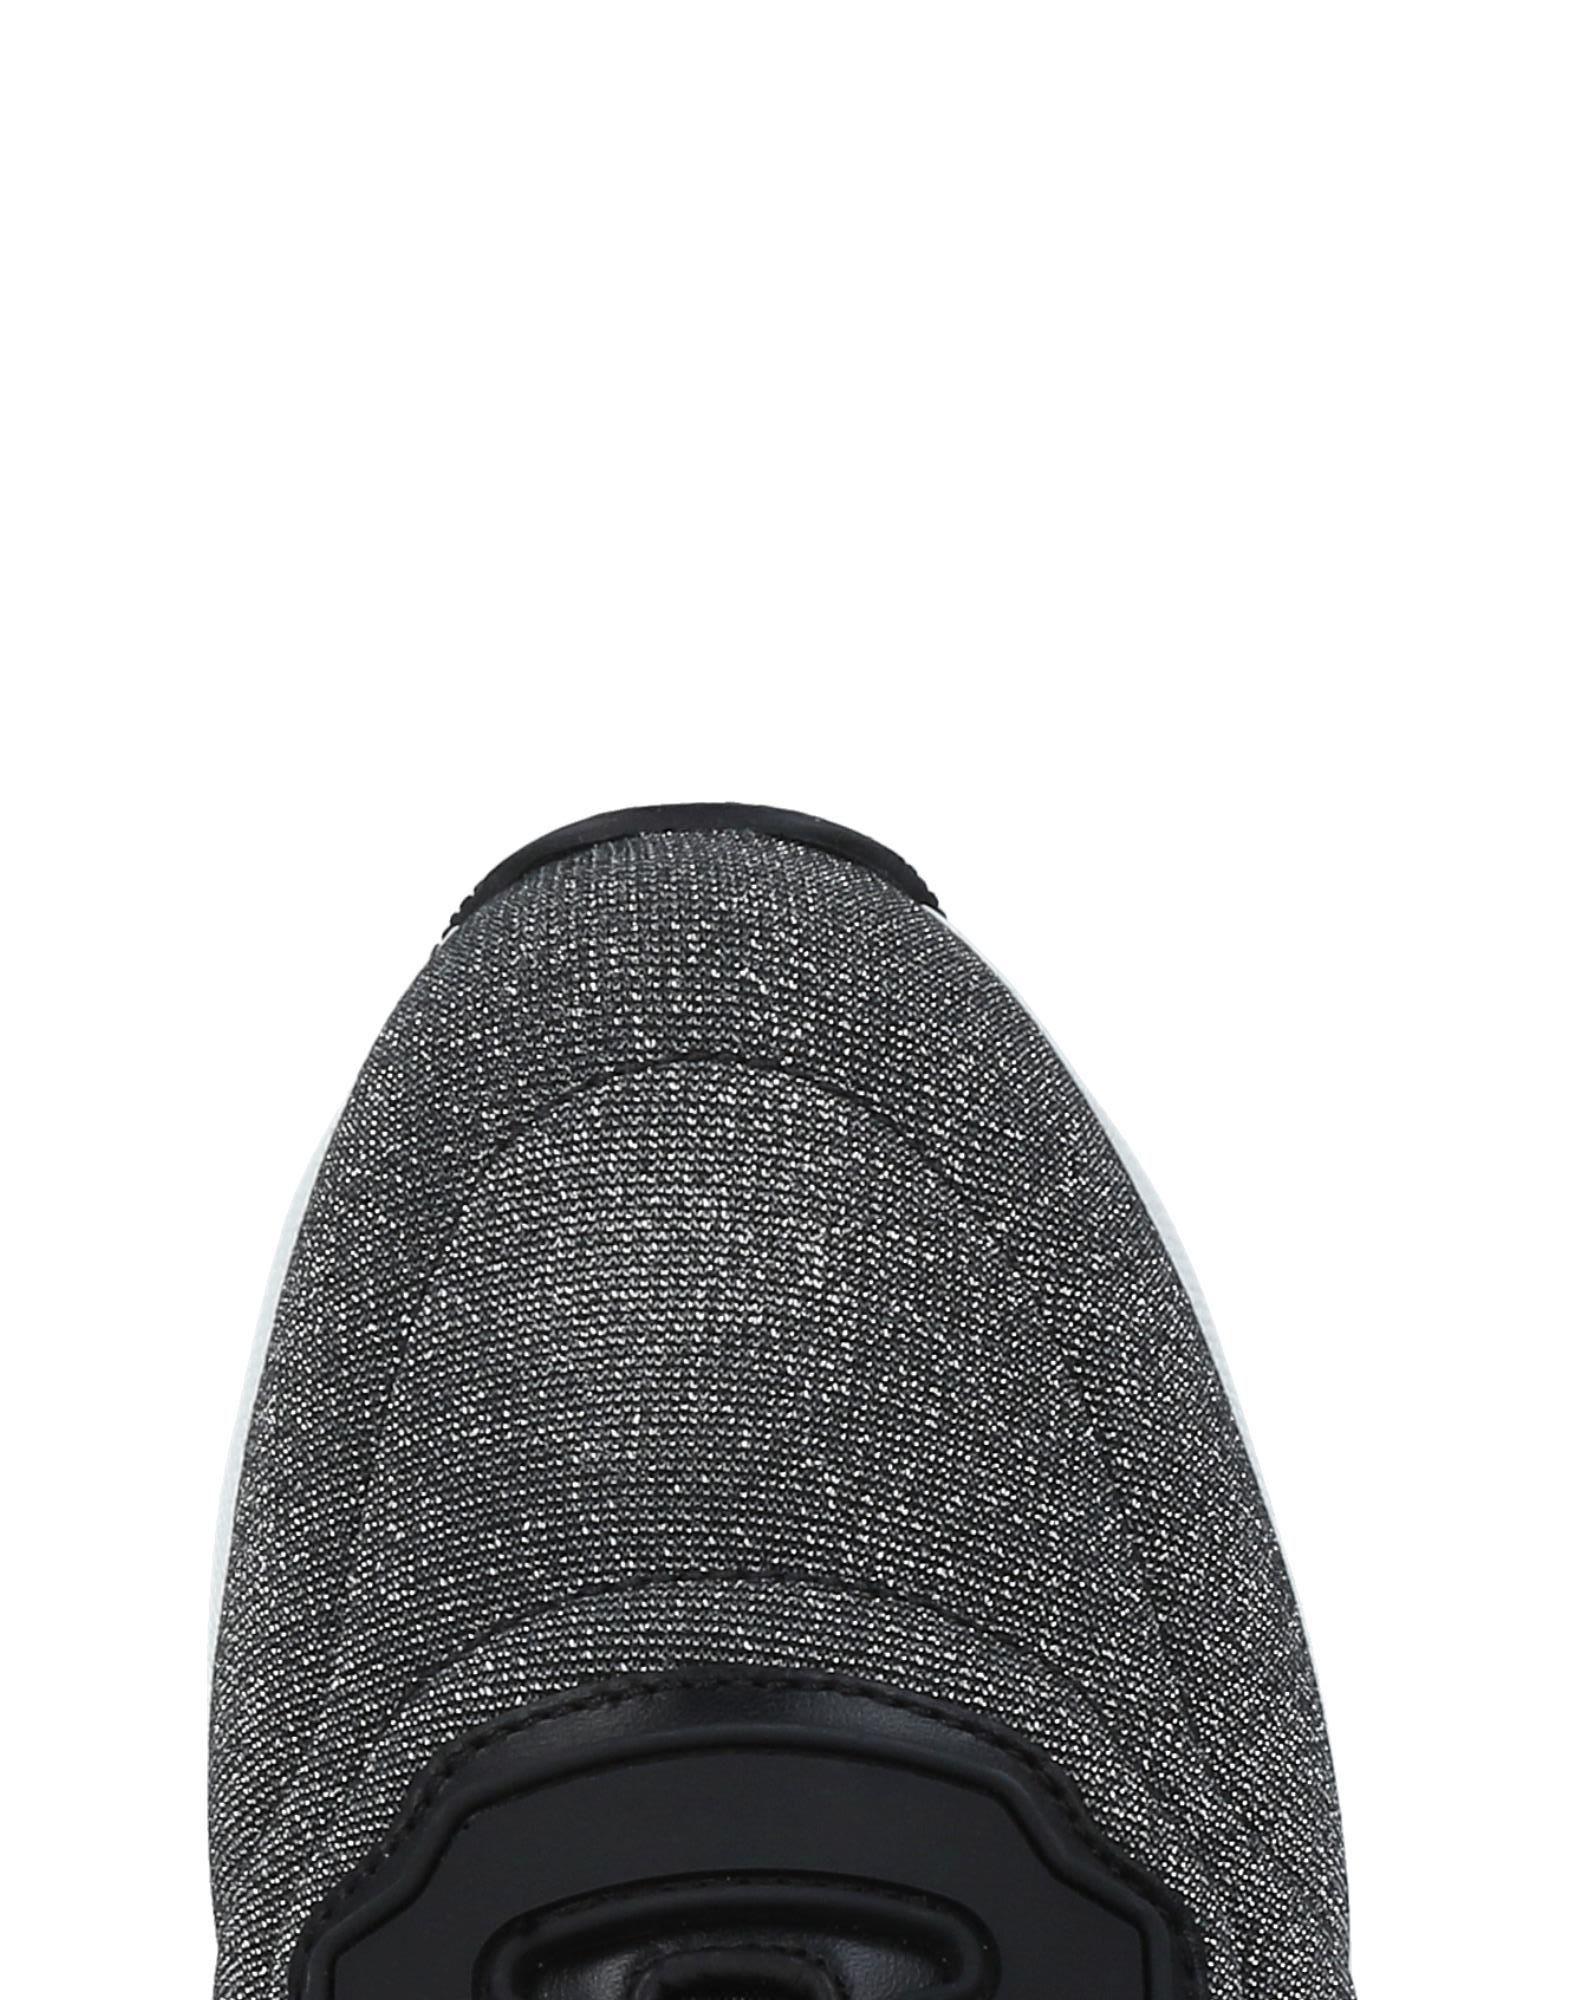 Rabatt Schuhe  Prada Sport Sneakers Damen  Schuhe 11482633SU ff8c3f